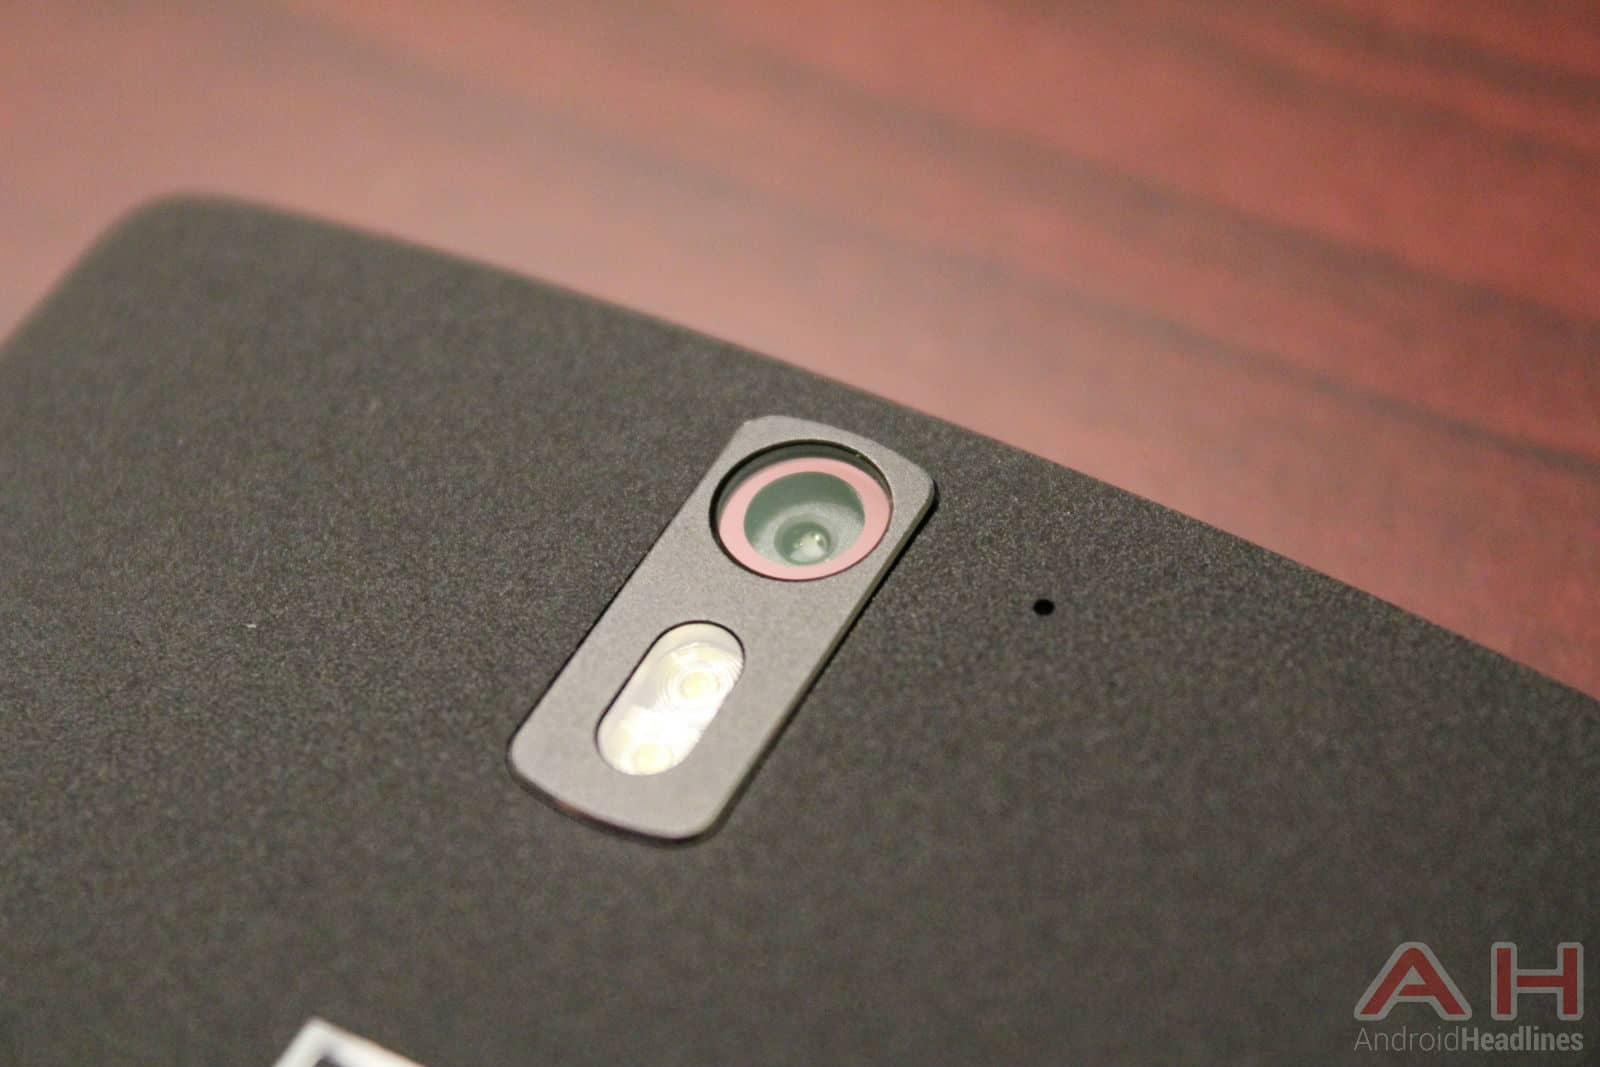 OnePlus-One-camera-2